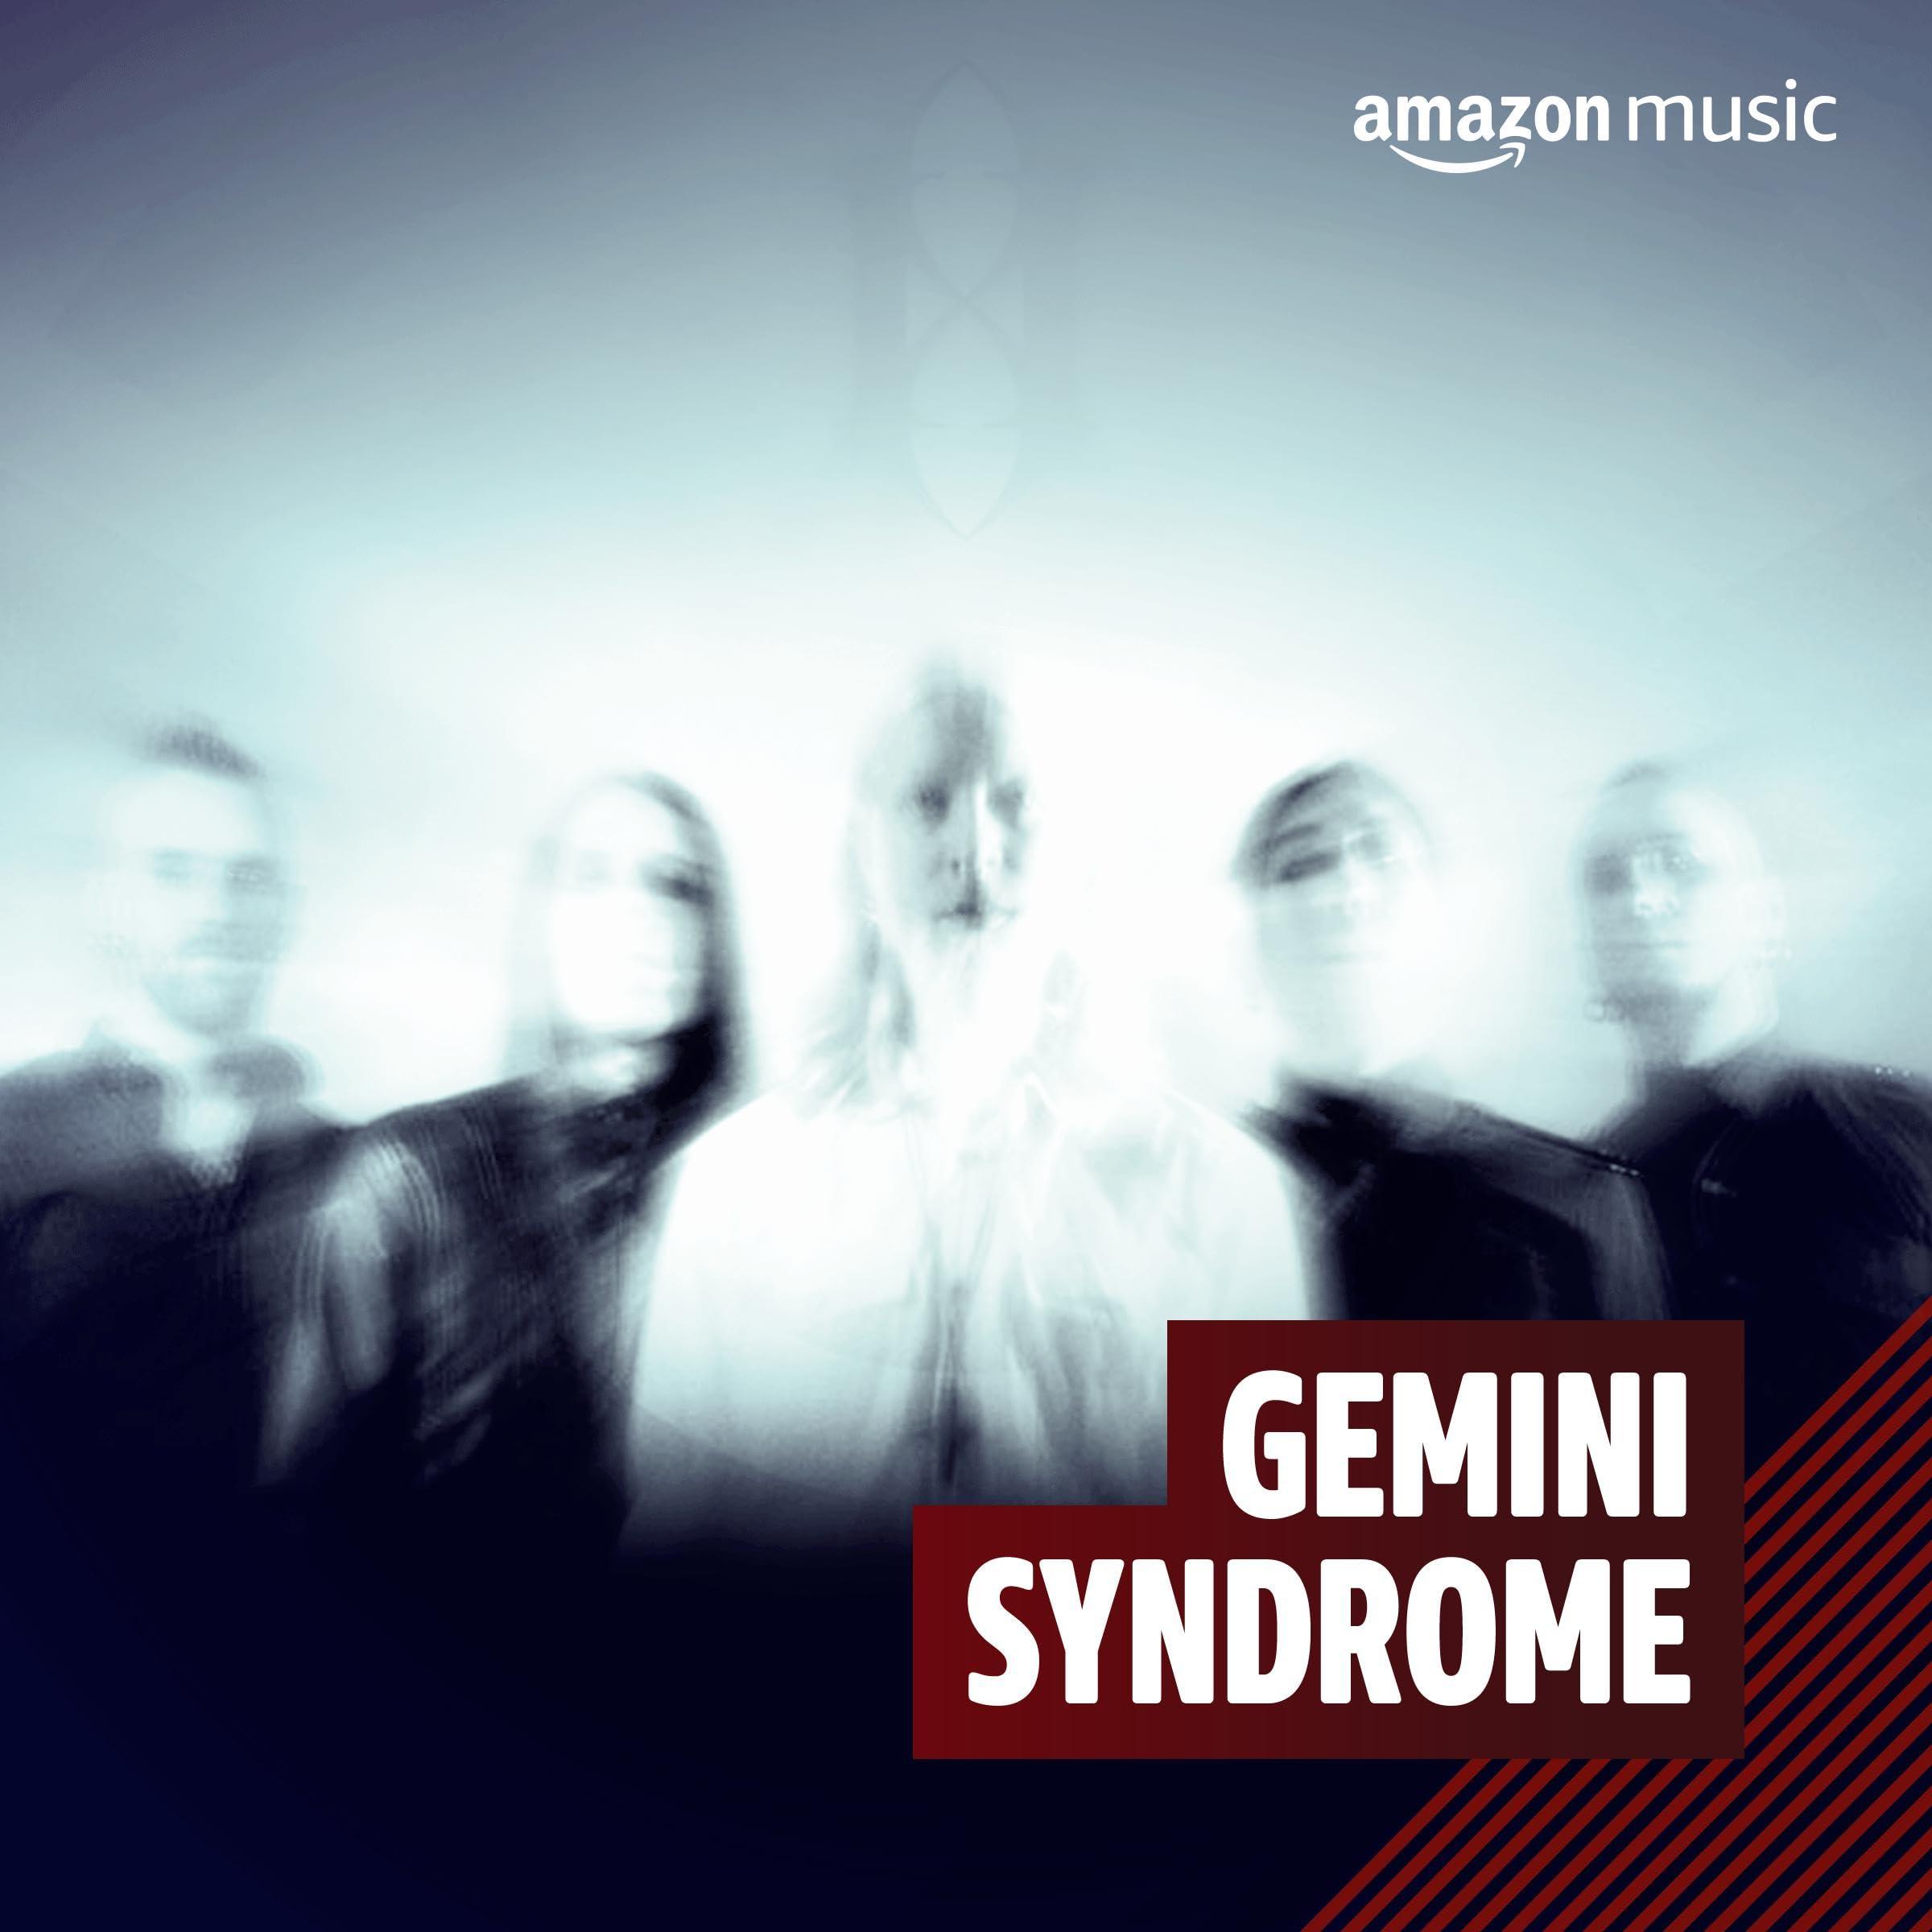 Gemini Syndrome